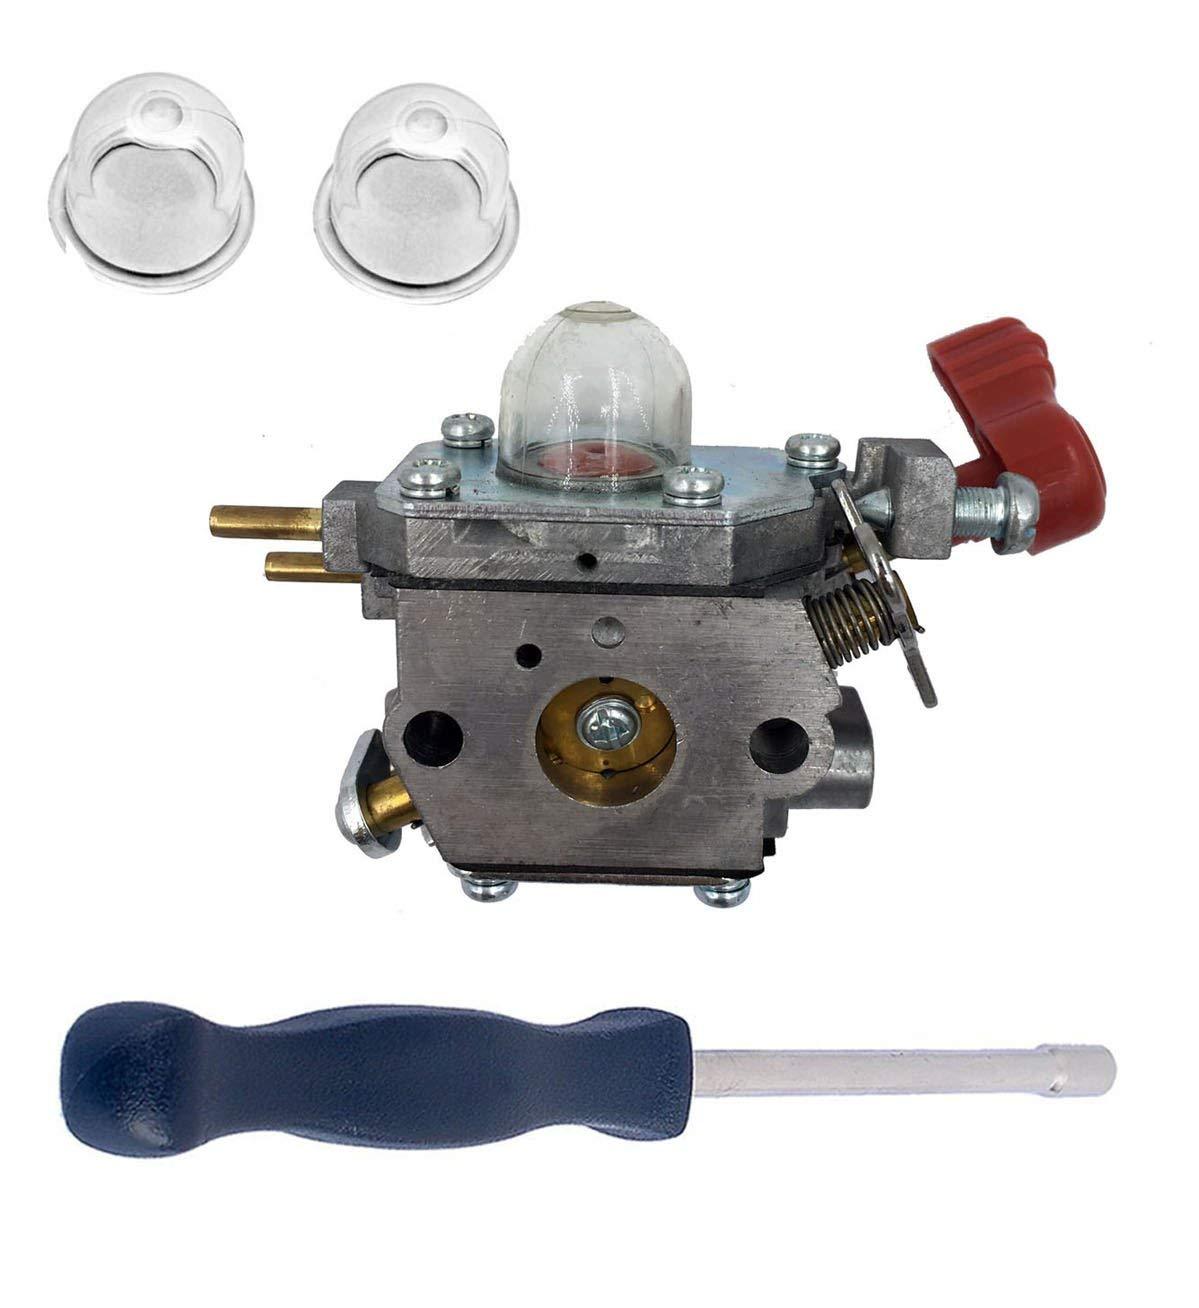 Hot Sale Carburetor W Adjustment Tool For Craftsman Troybilt Bolens Zama Diagram Mtd Cub Cadet Yard Machine Trimmer Replace 753 06288 C1u P27